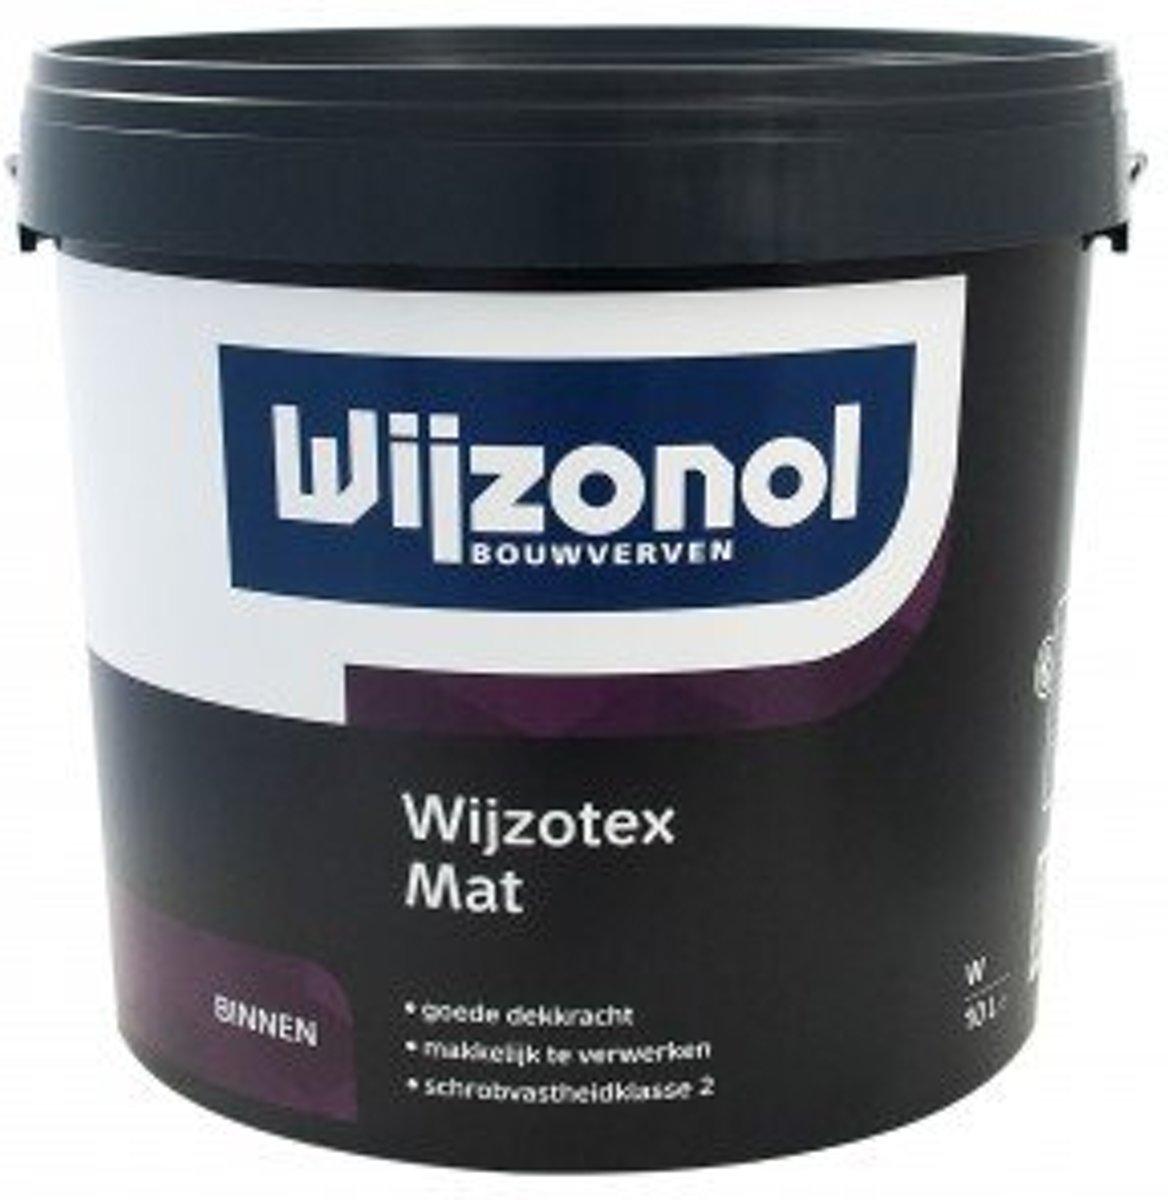 Wijzonol Wijzotex Mat 10 liter wit